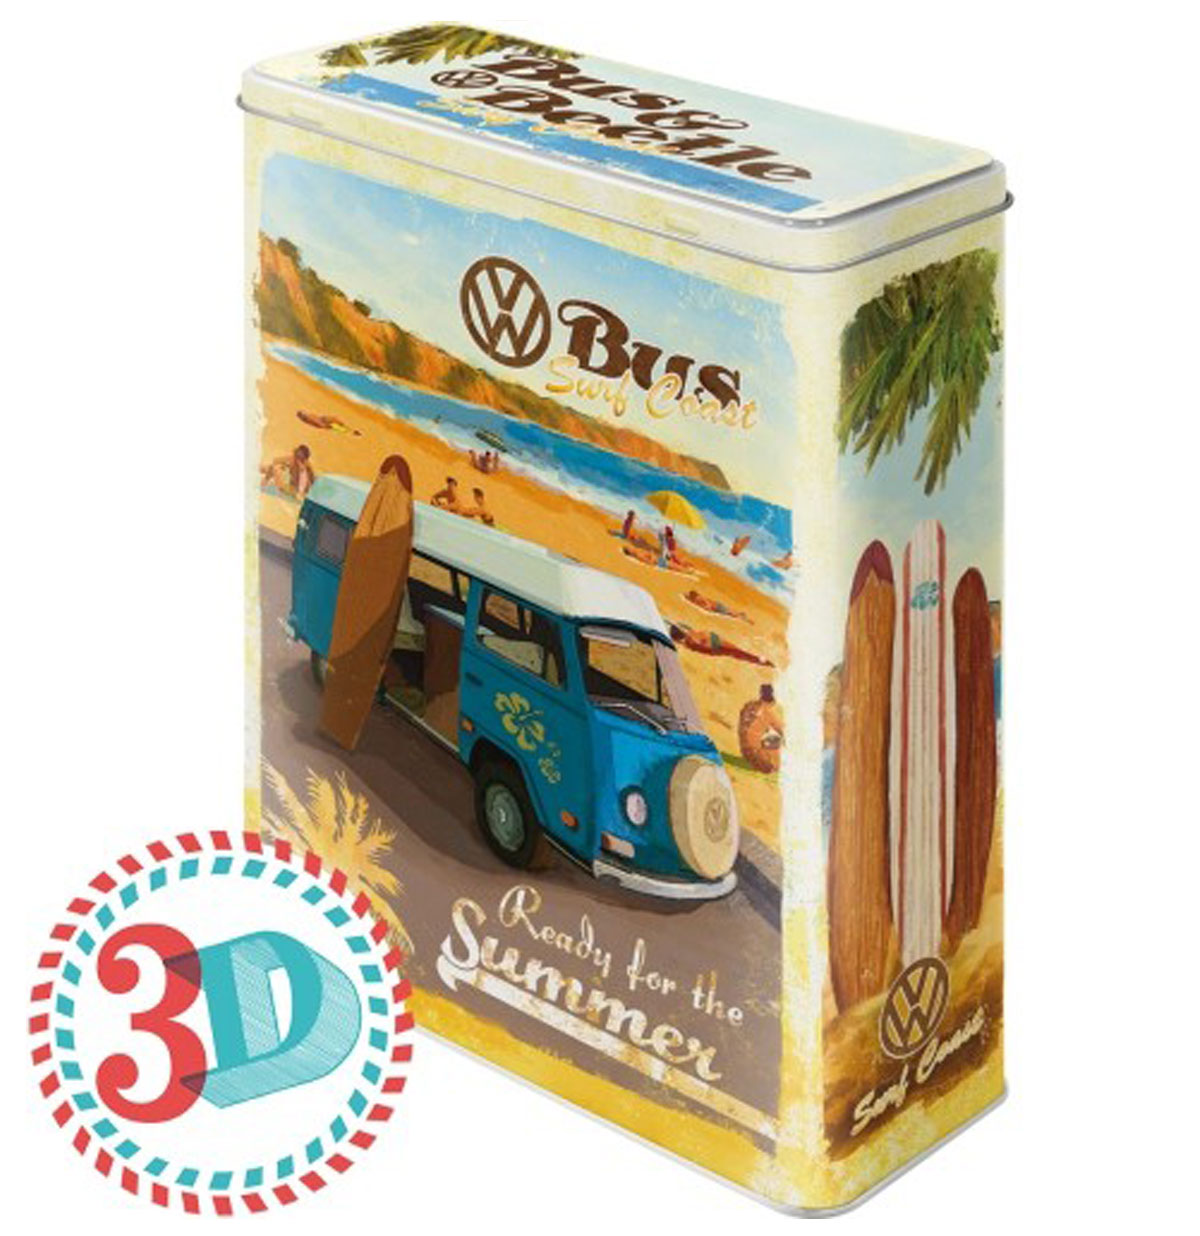 VW Volkswagen Bus & Beetle Surf Coast Tin Box XL